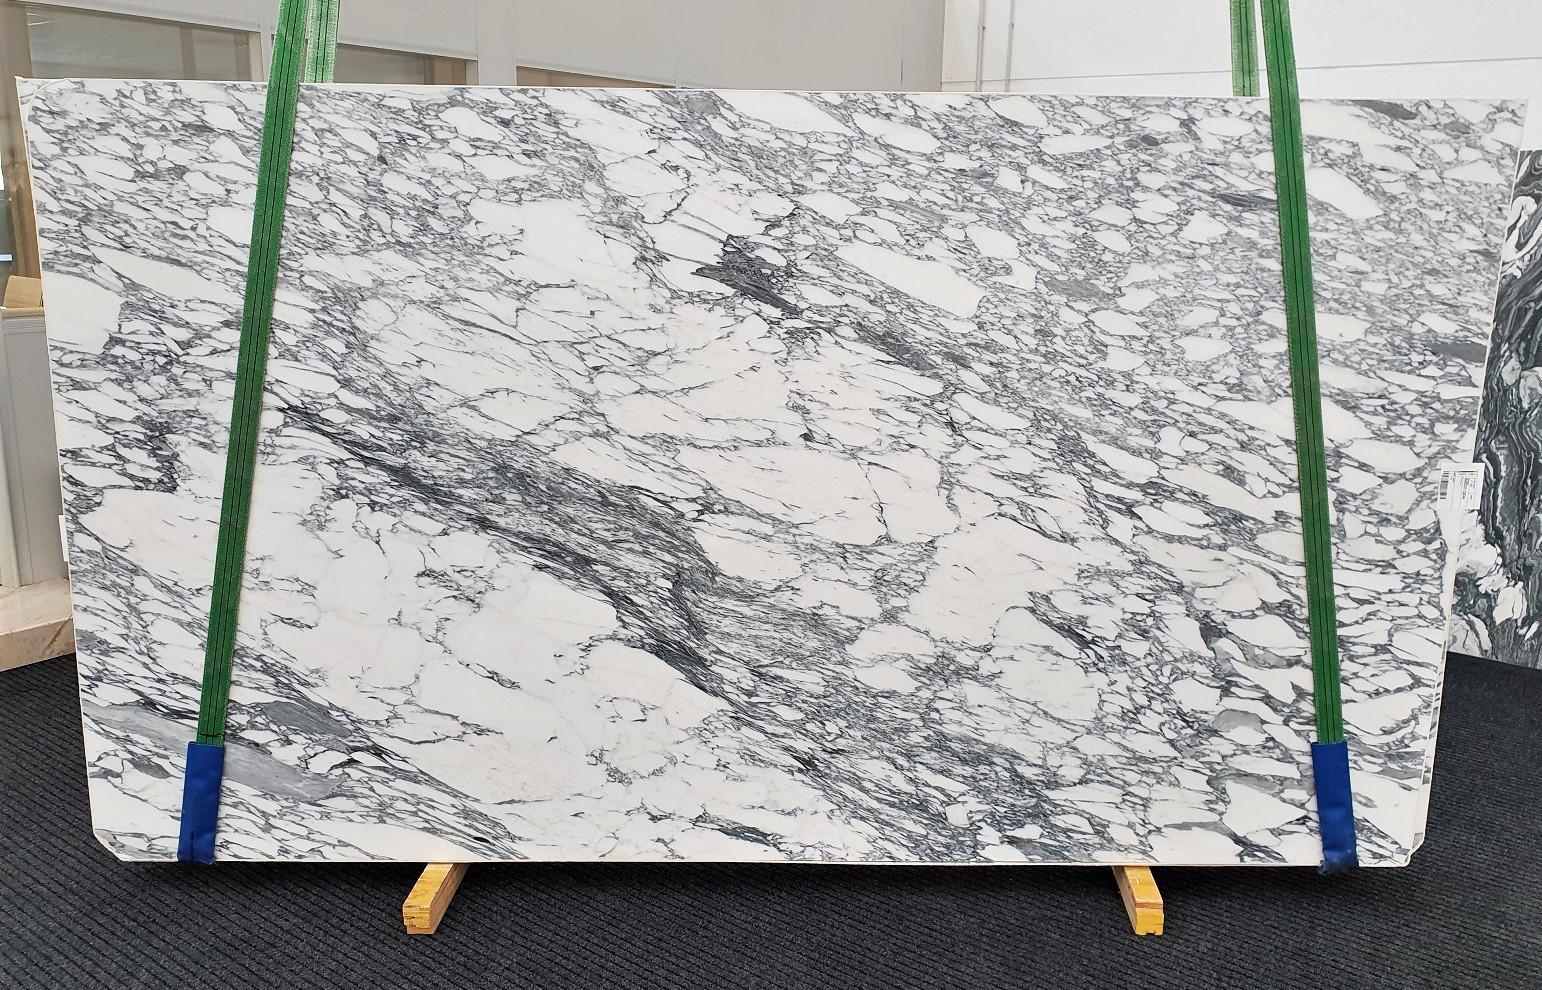 ARABESCATO CORCHIA Supply Veneto (Italy) polished slabs 1420 , Slab #45 natural marble